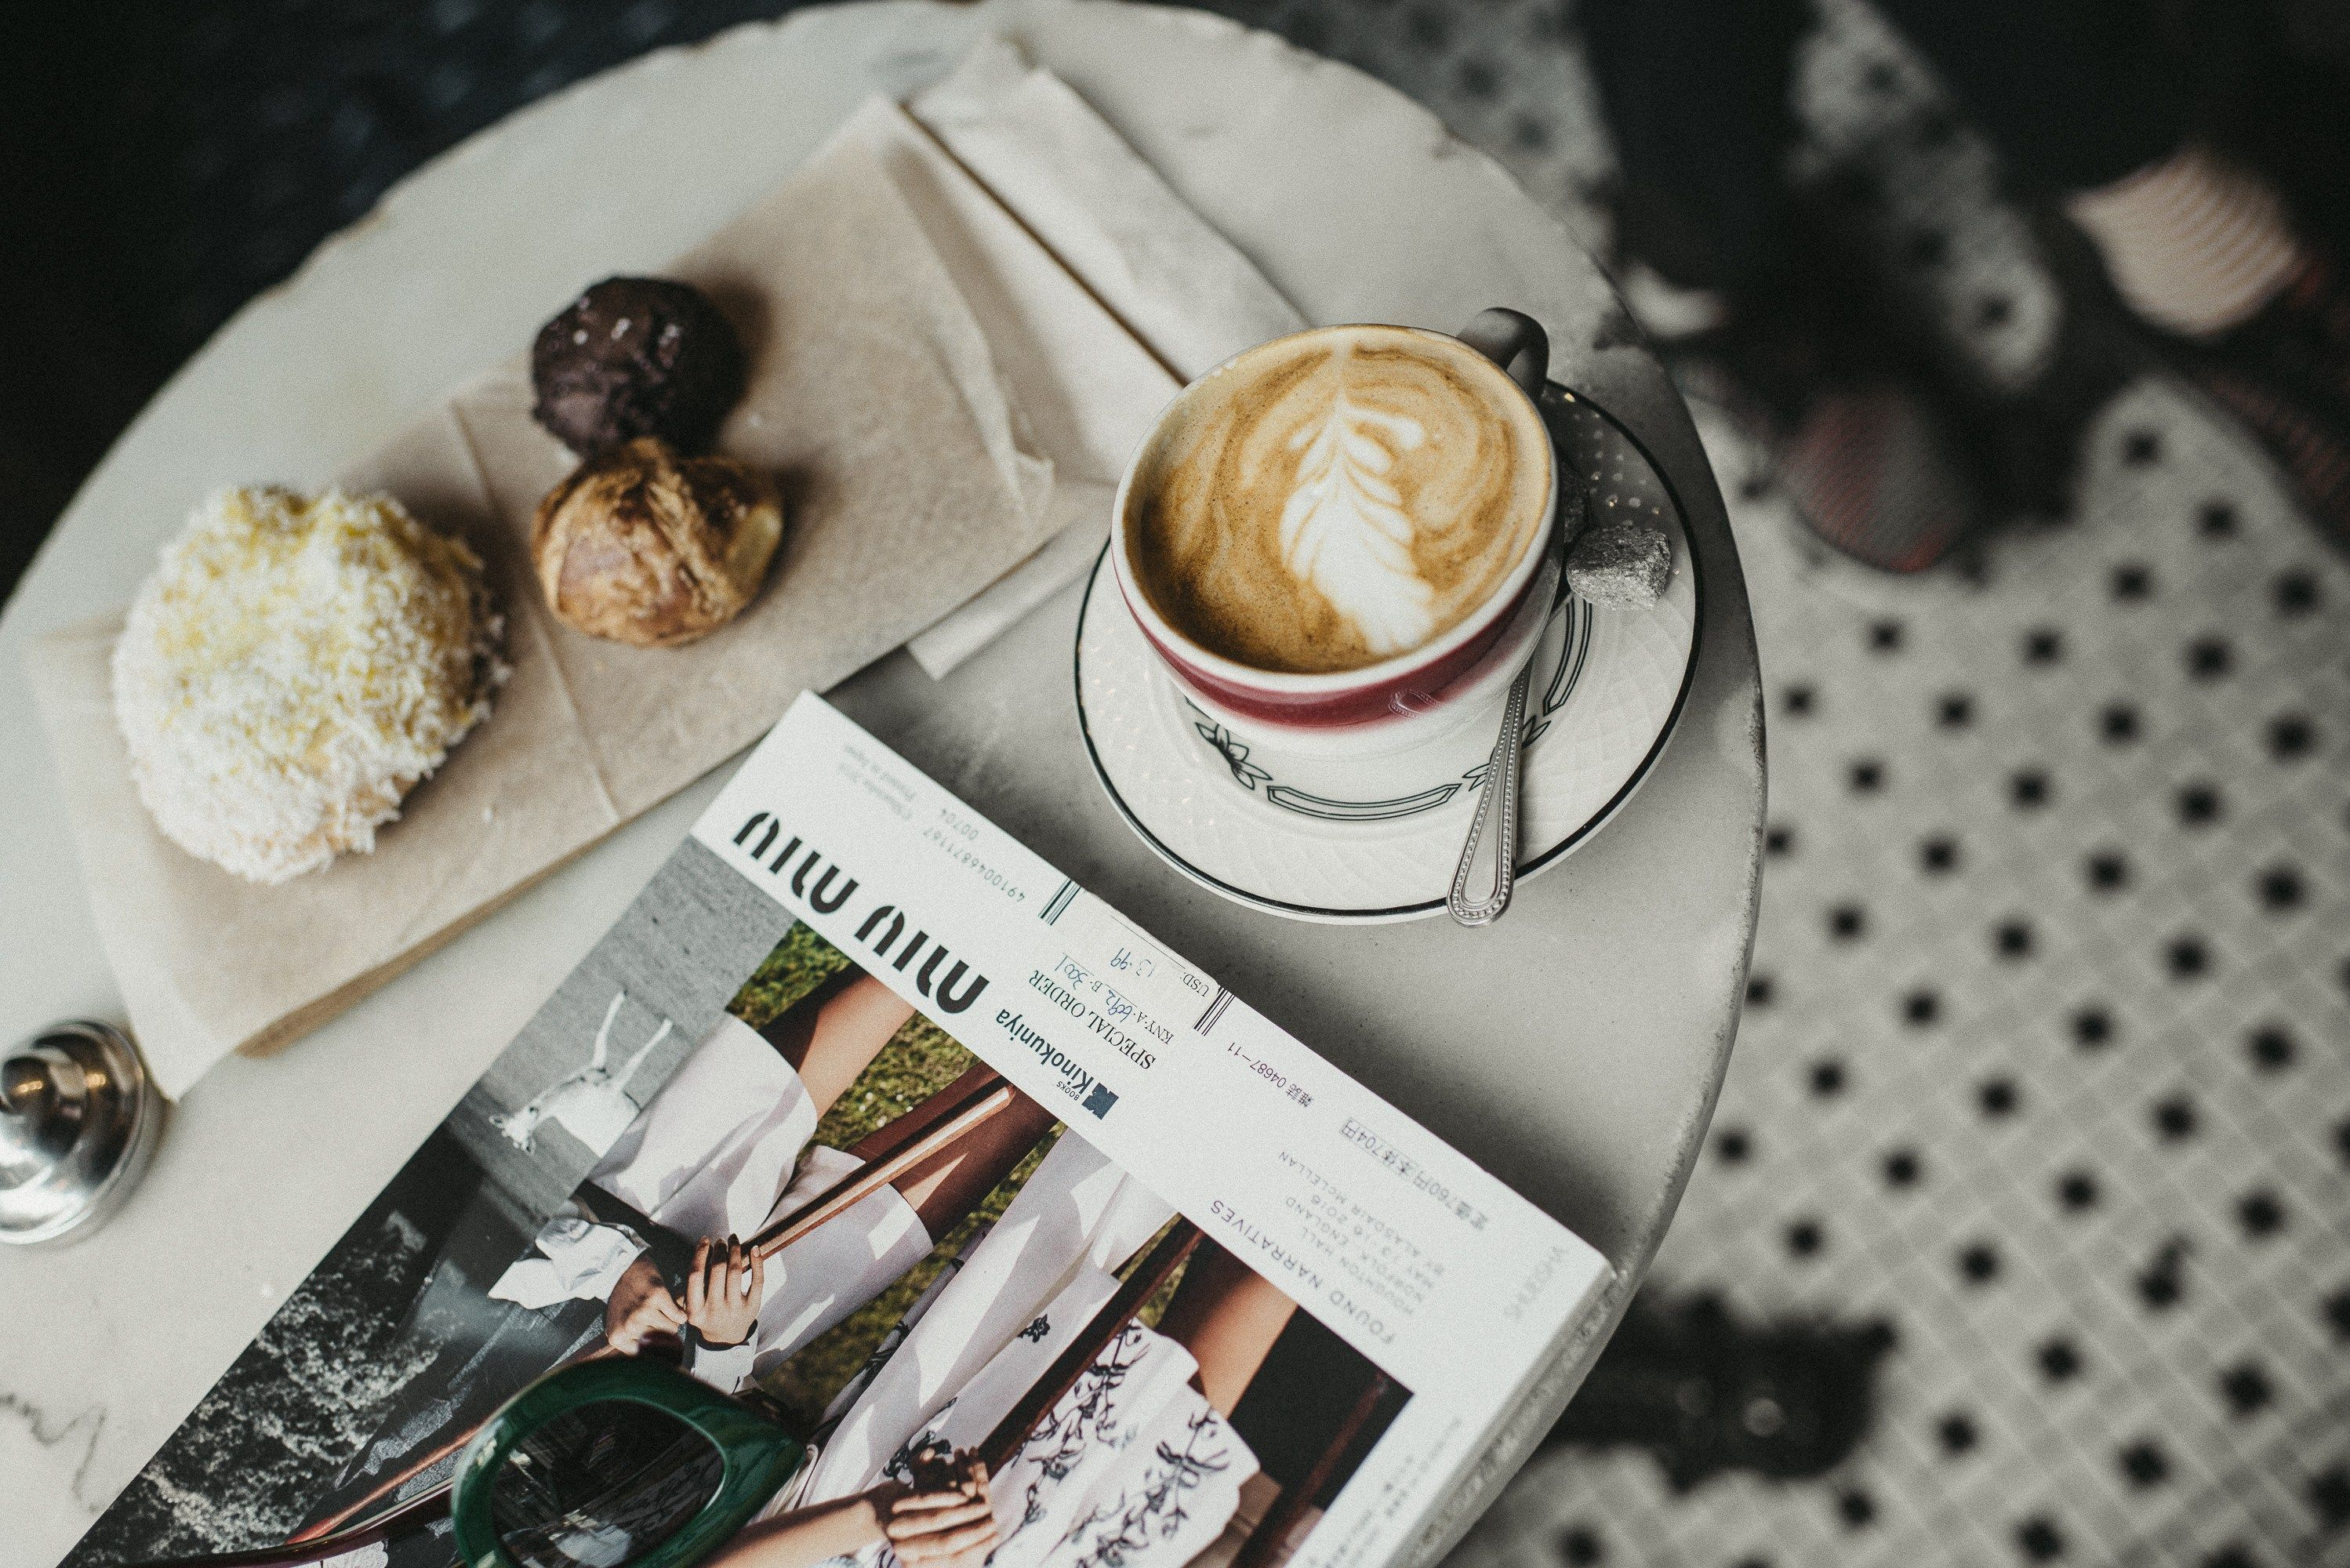 Coffee break at Bakeri NYC | #food #photooftheday #fashionblog #nyceats #lifestylephotography #coffeeaddict #fwis #brunchclub #nycblogger #nycphotog #bakedgoods #foodphotography #cappuccino #aesthetic #styleblog #pastries #nyccoffeeshops